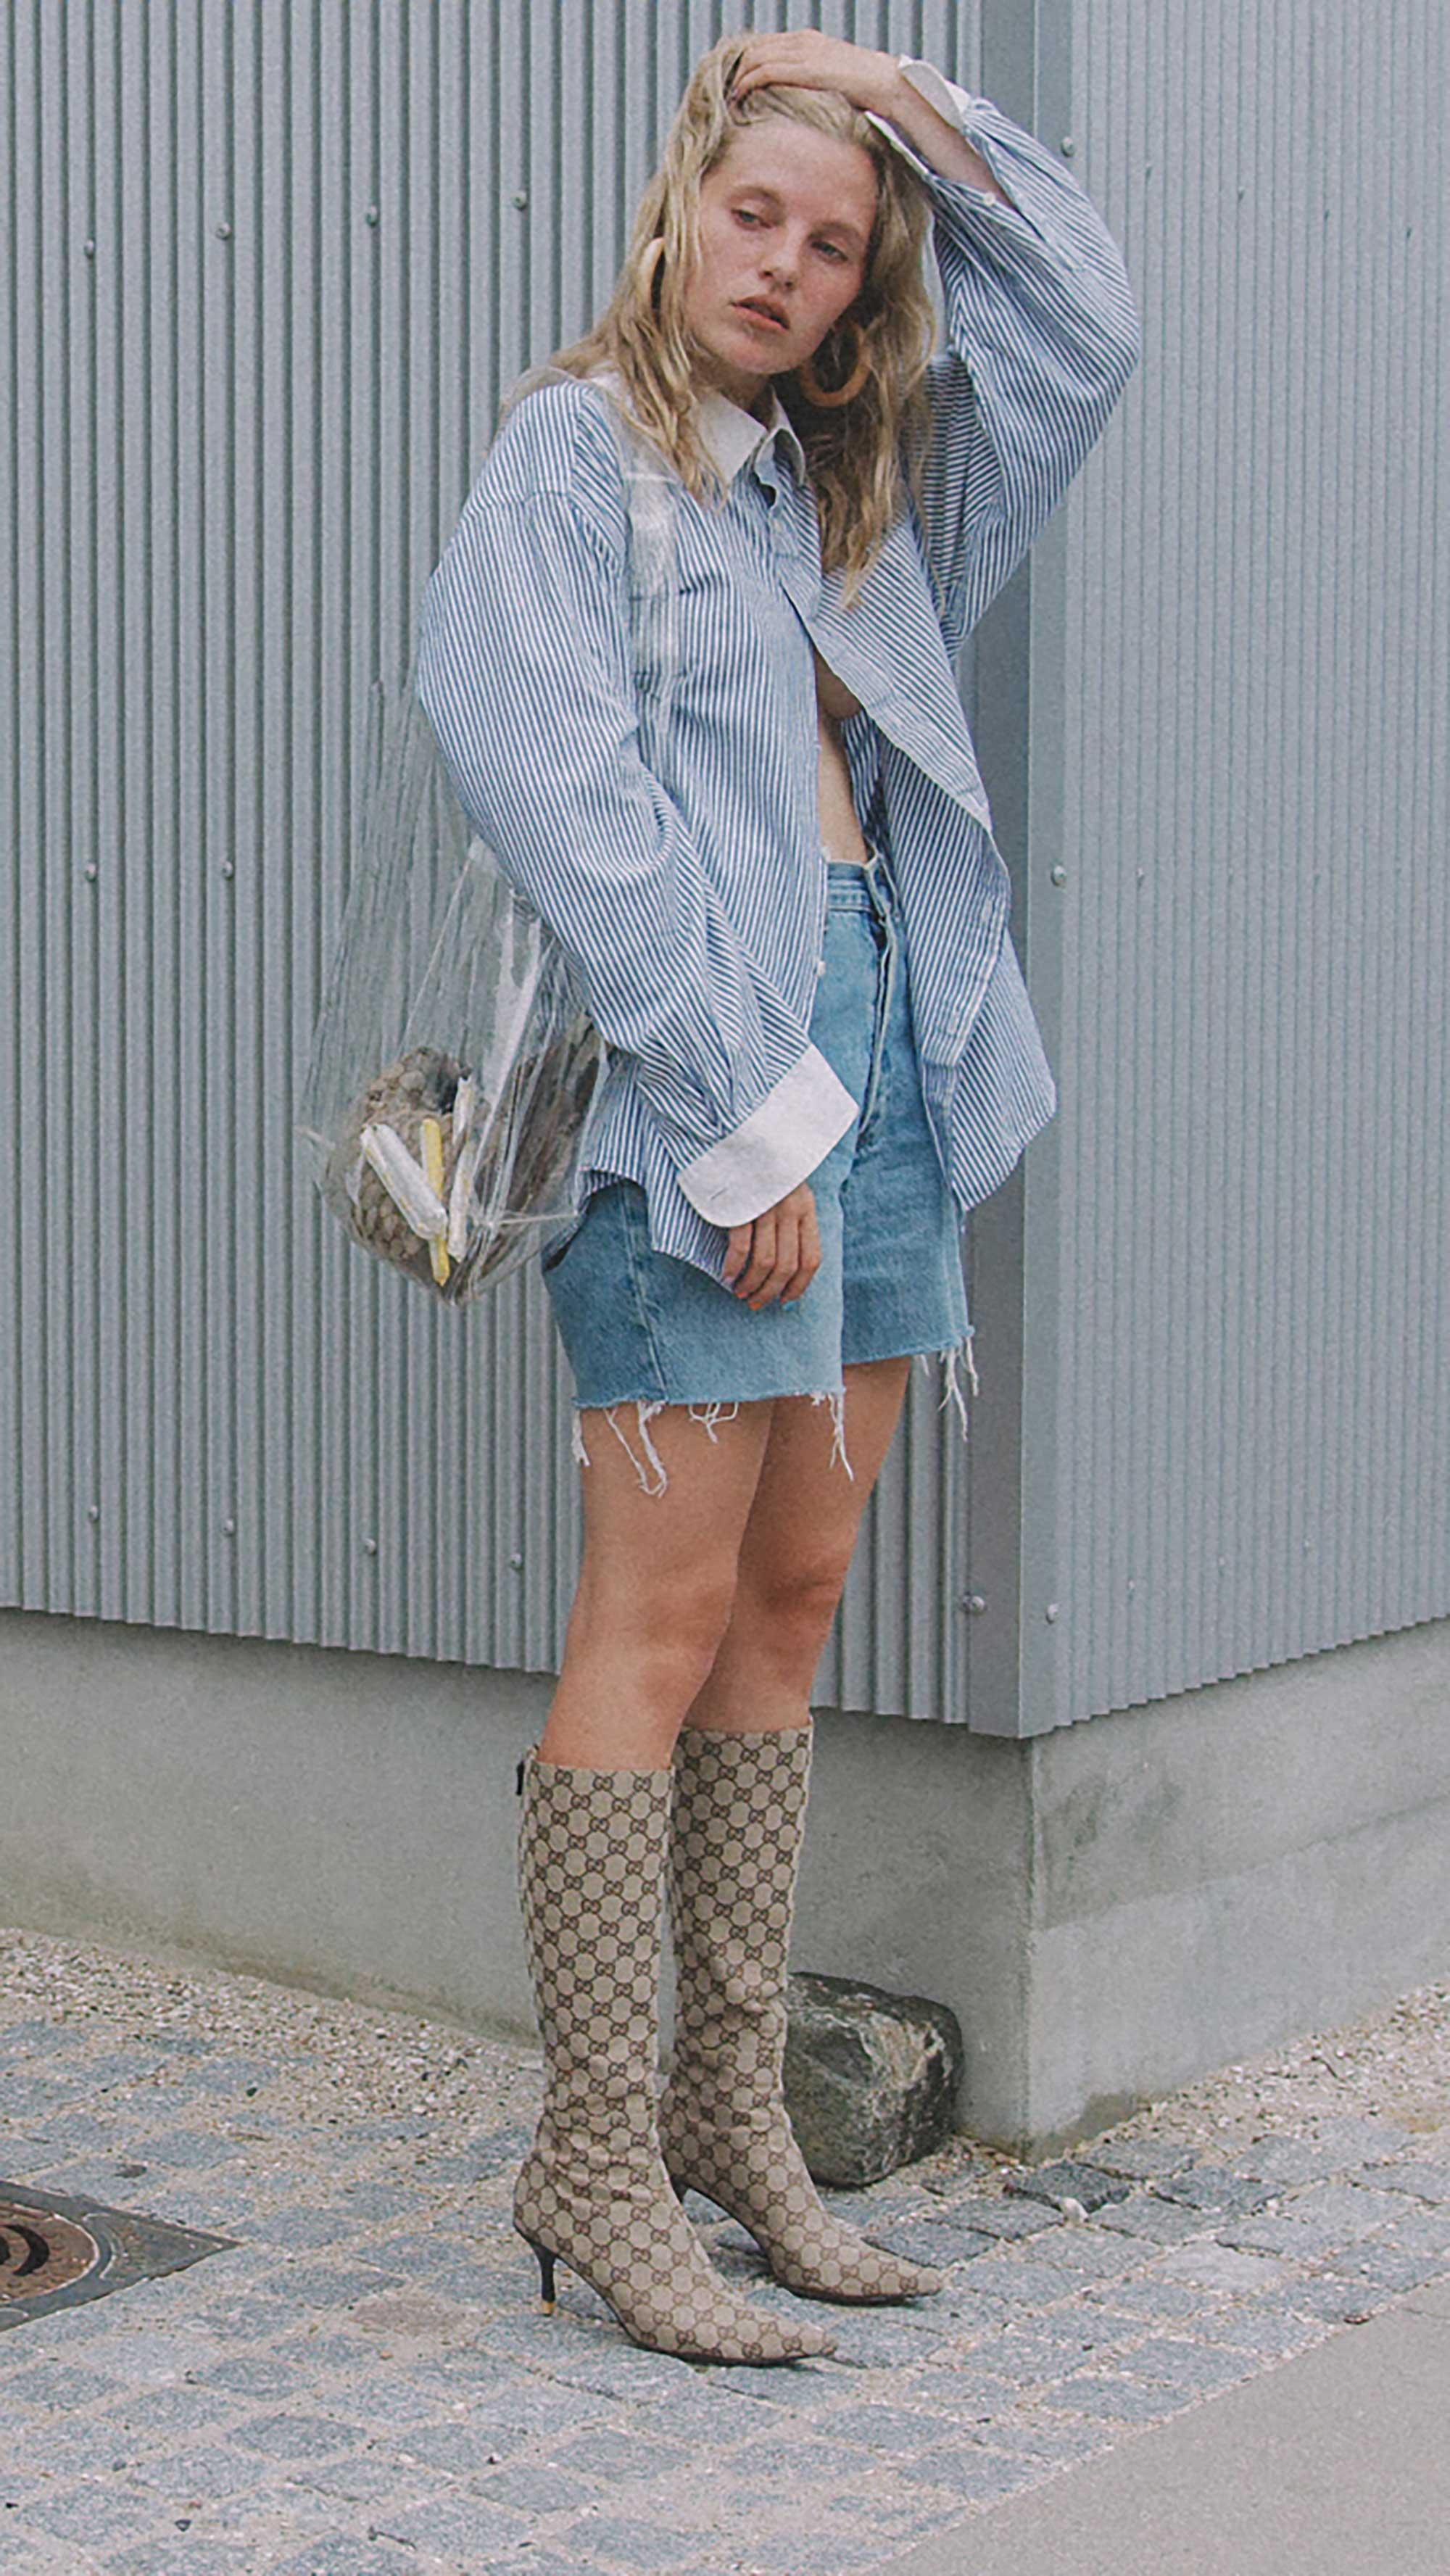 Best outfits of Copenhagen Fashion Week street style 2018 Photo by @J2martinez Jose J. Martinez -25.jpg